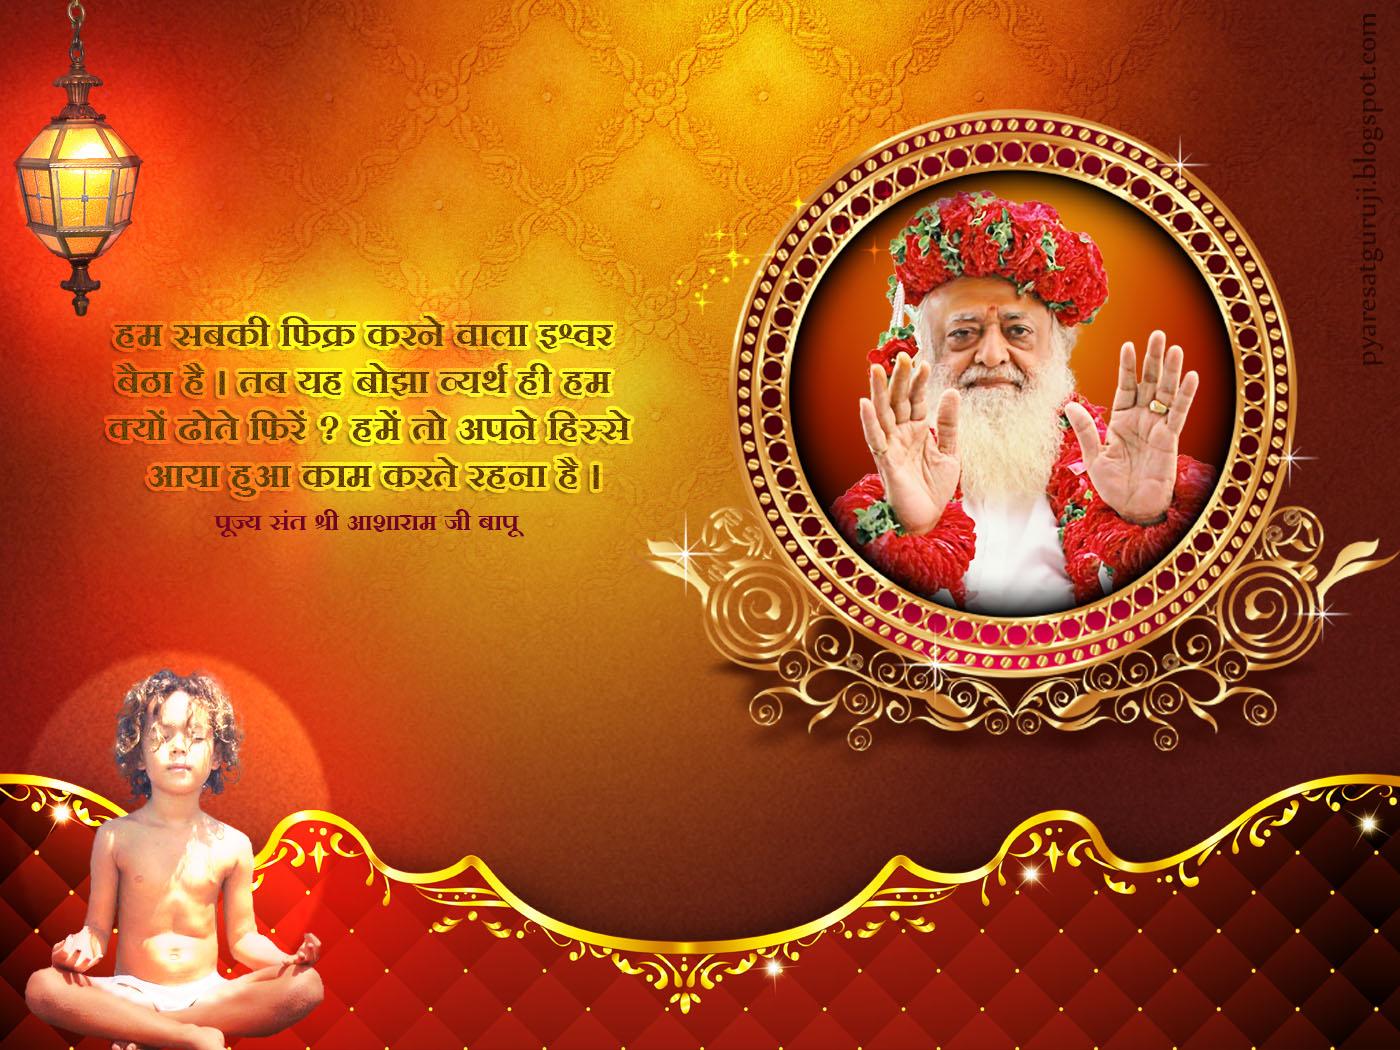 asharamjibapu-bapu-ashram-asharamji-asaram-asharamji-wallpaper-wp5203176